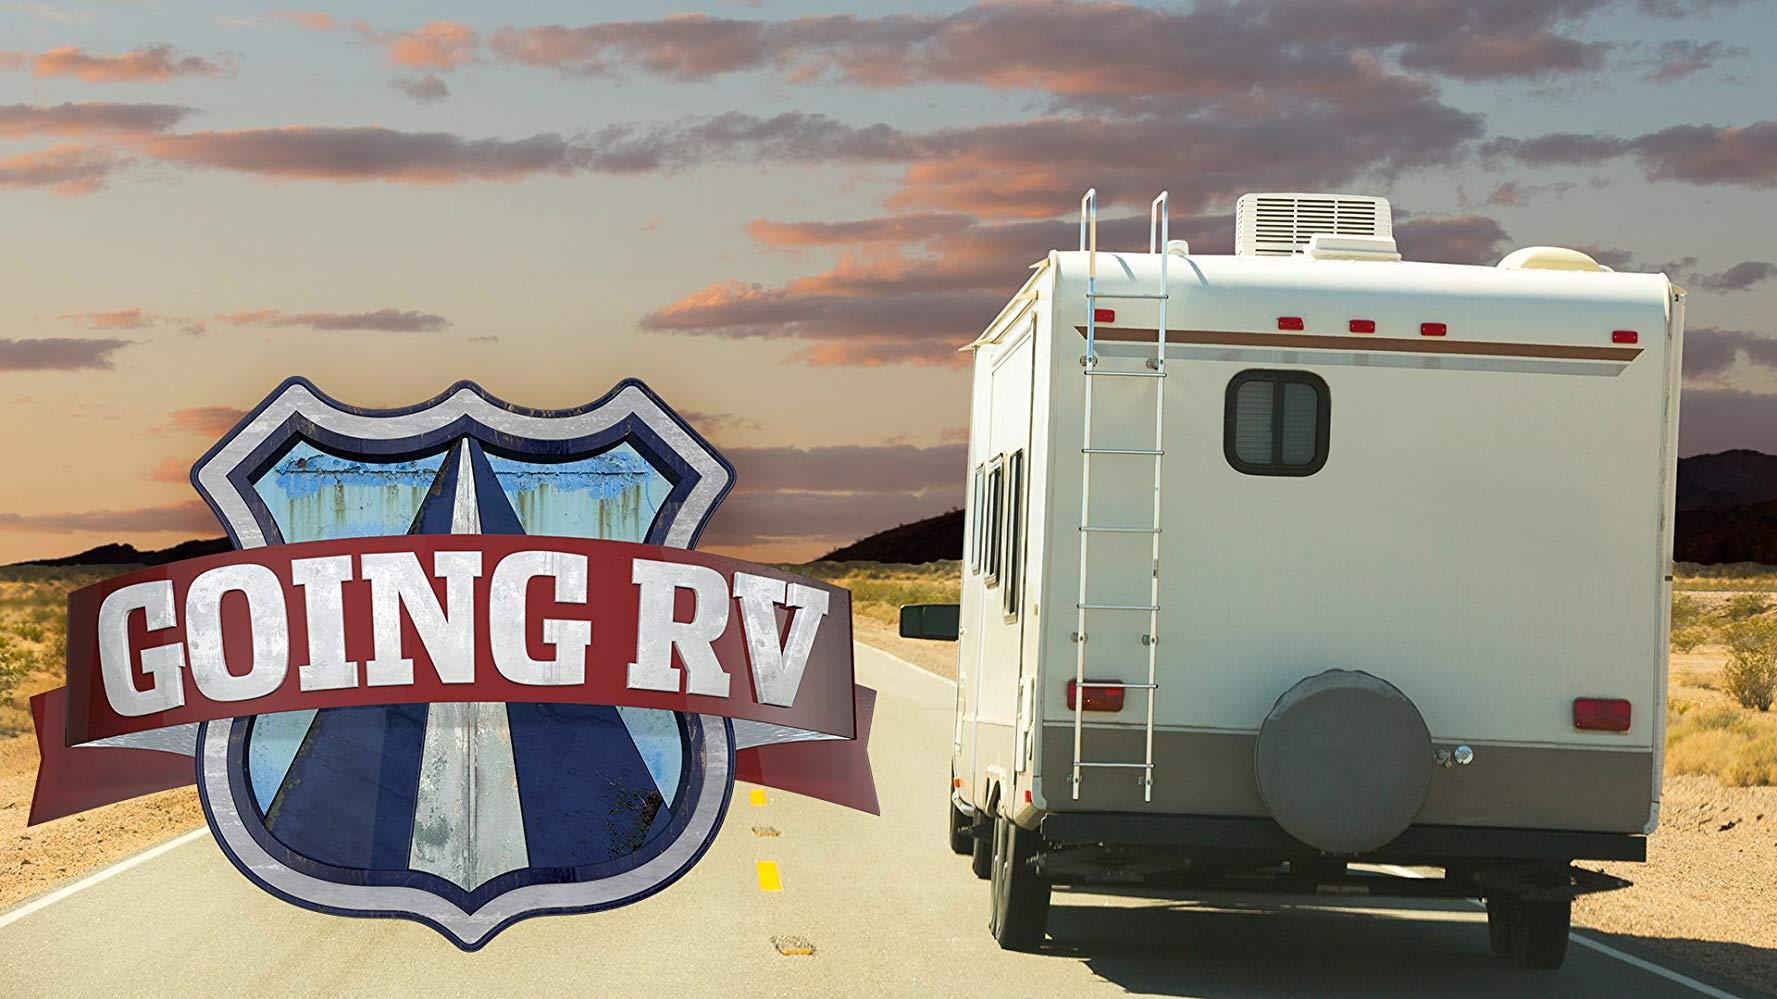 Going RV S03E02 HDTV x264-dotTV